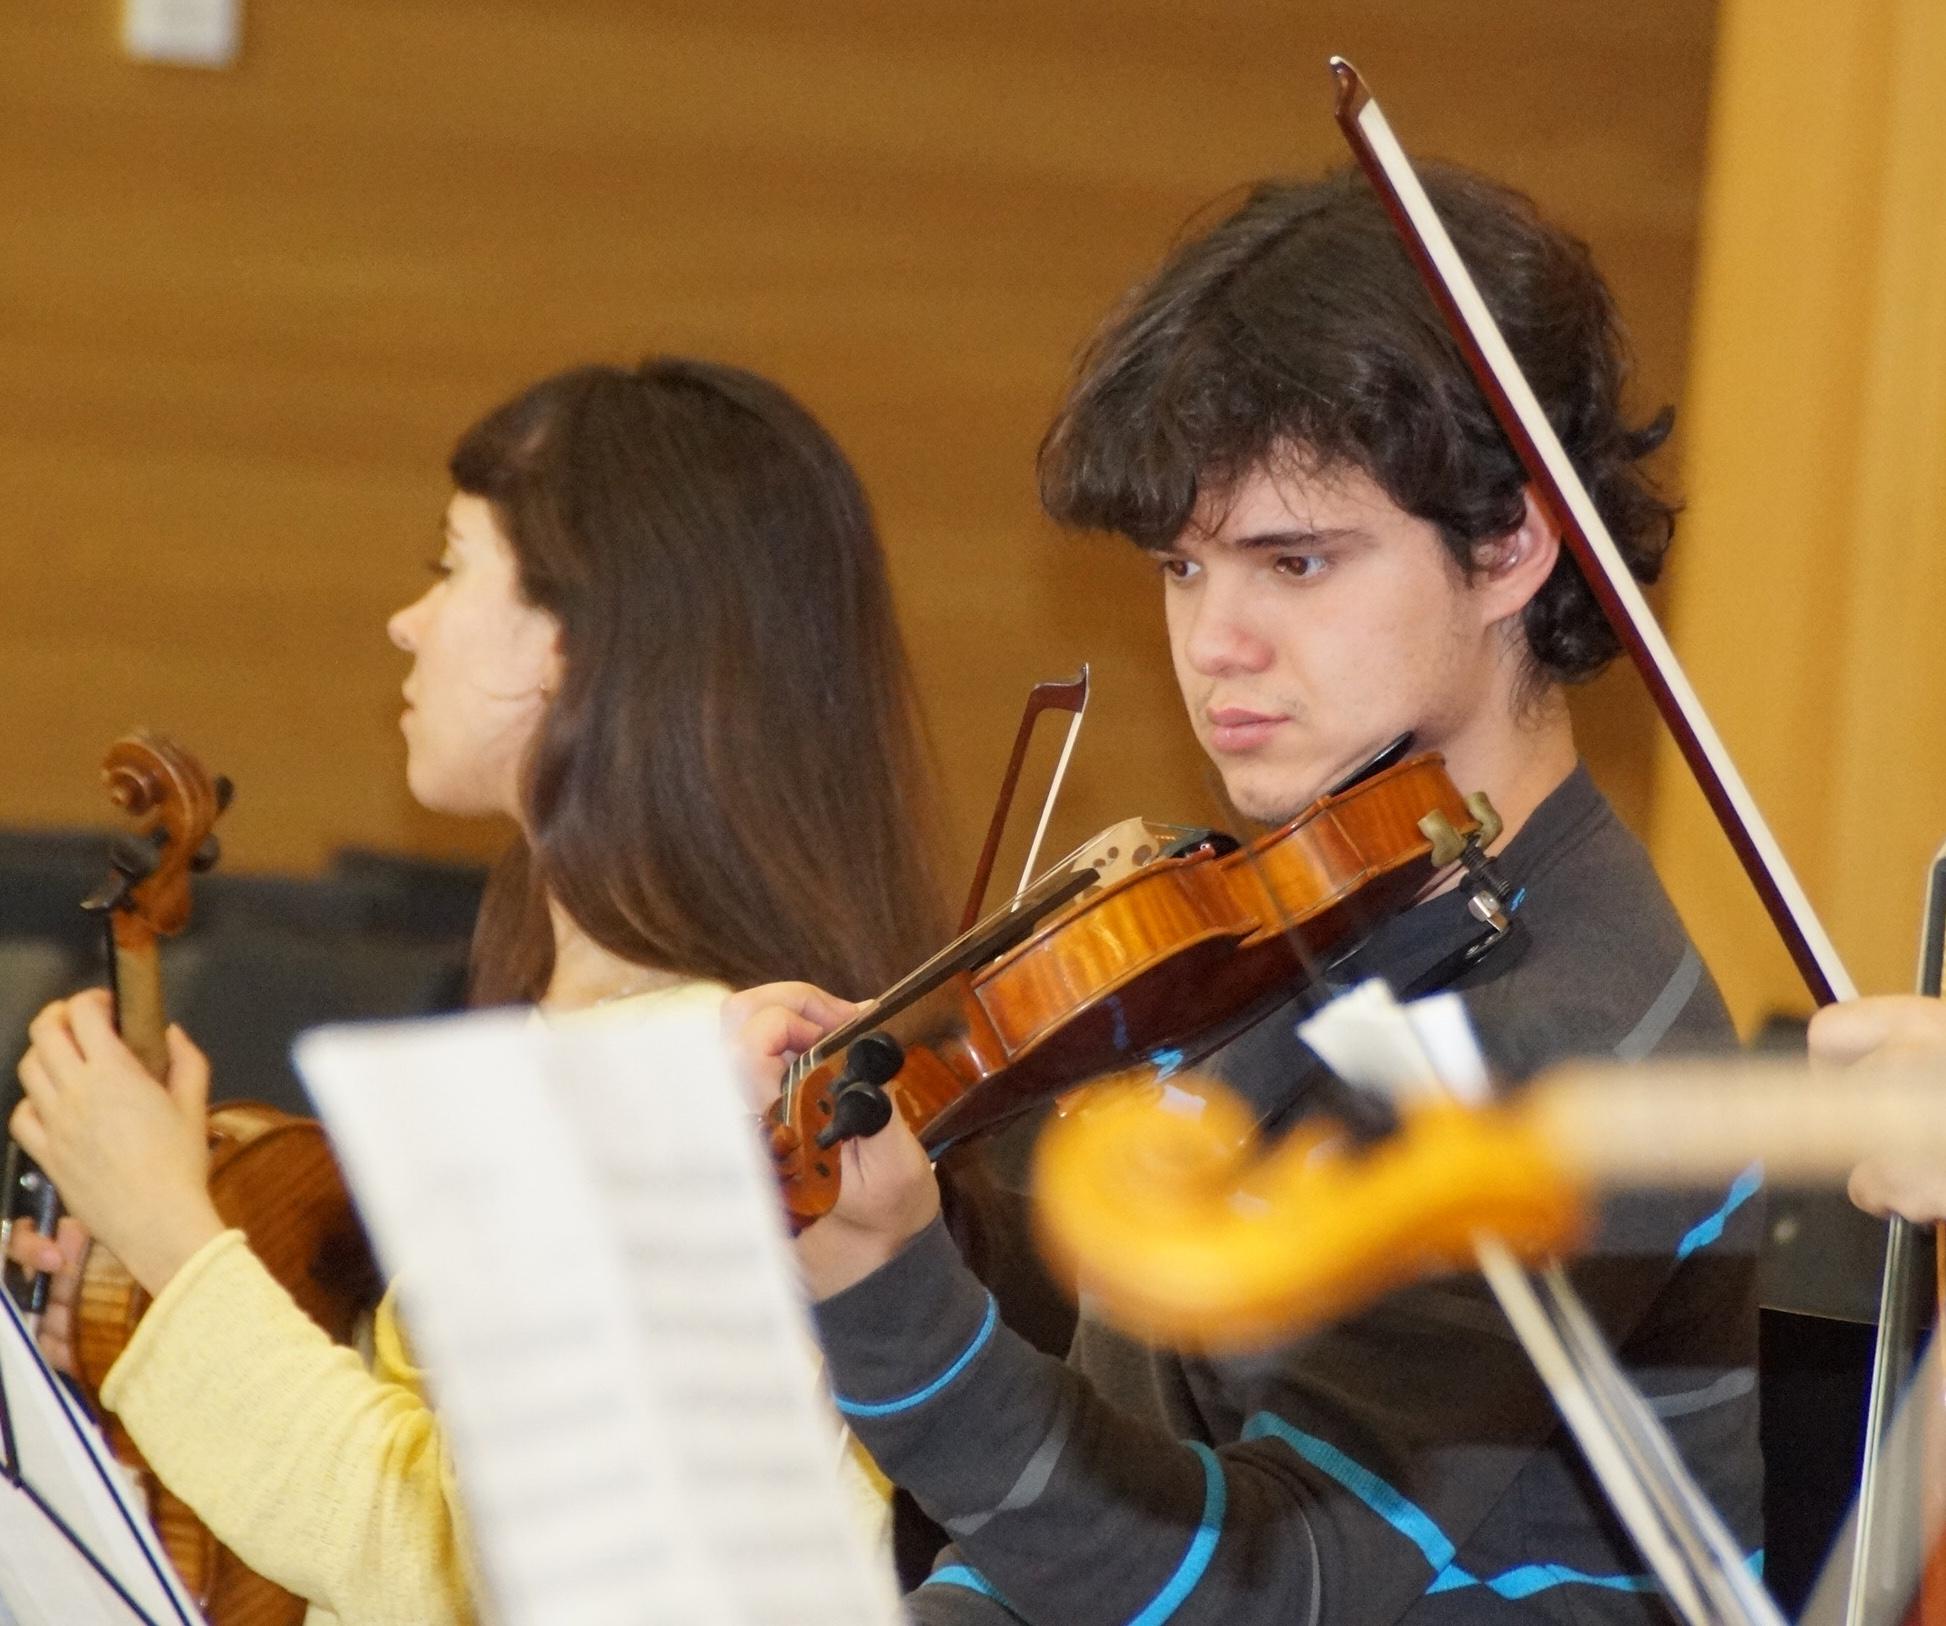 Musik verbindet, quod erat demonstrandum!